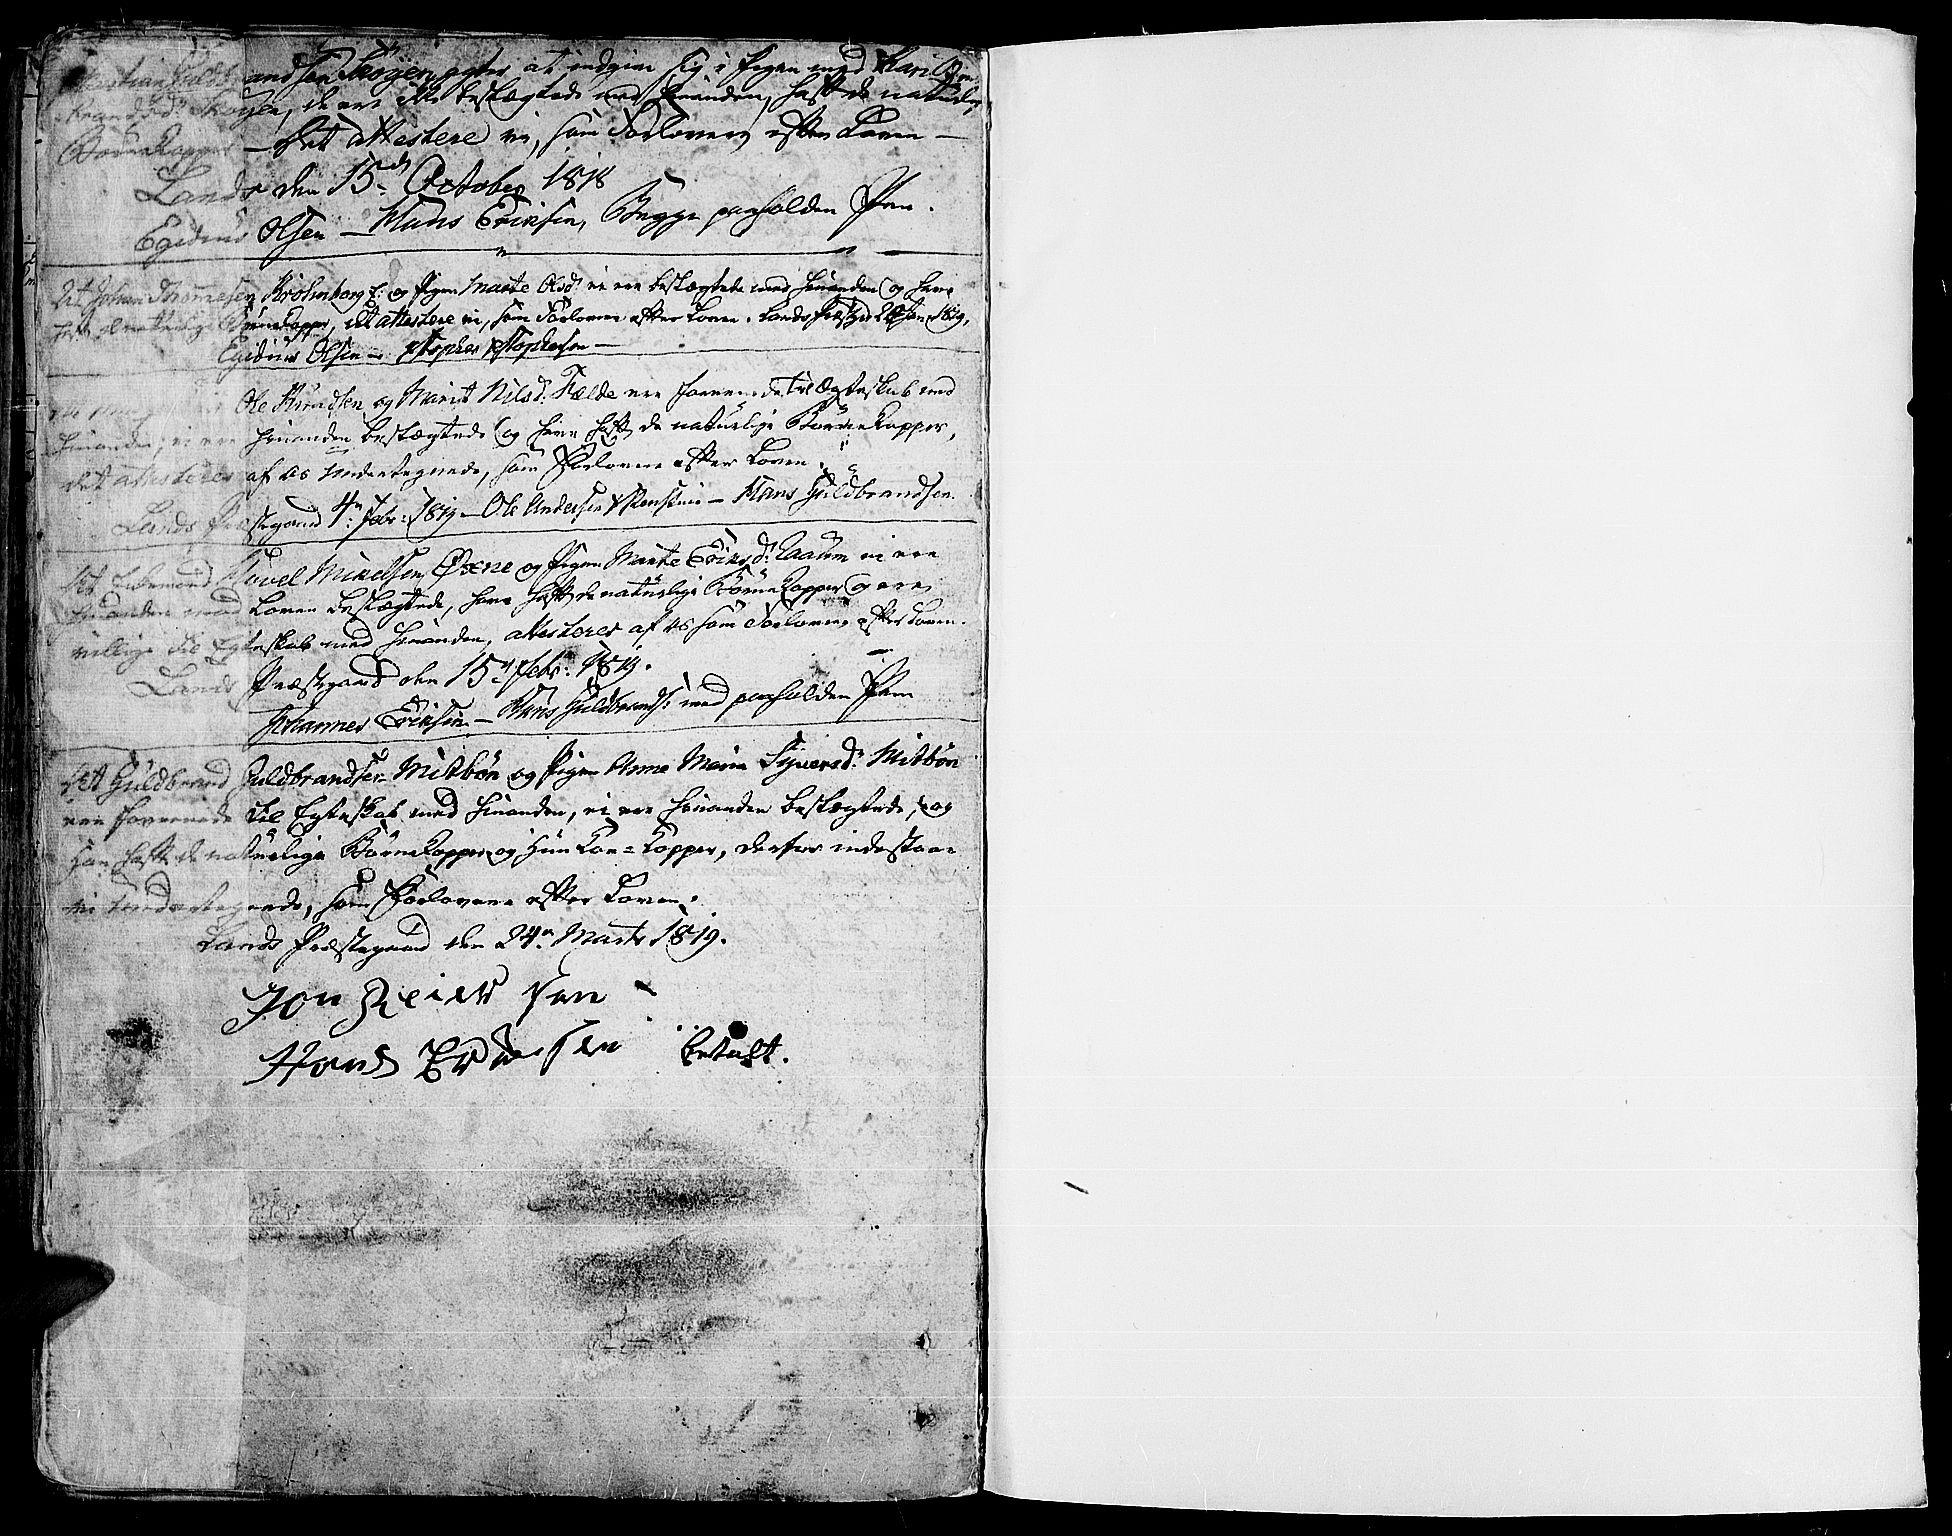 SAH, Land prestekontor, Ministerialbok nr. 6, 1784-1813, s. 189